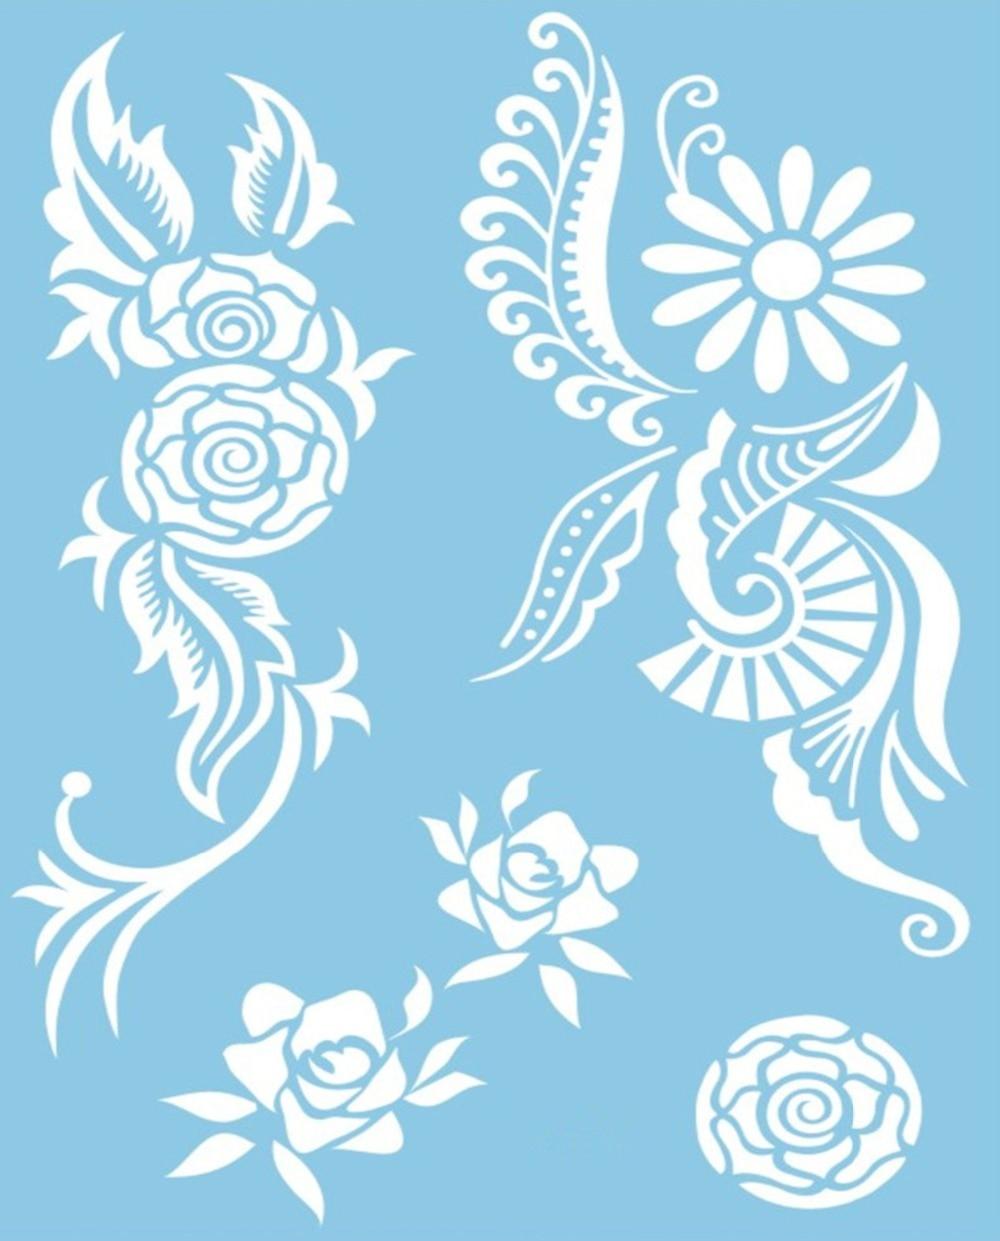 White Lace Tattoos Body Jewelry Temporary Tattoos Stickers Flash Tattoo font b Style b font Body